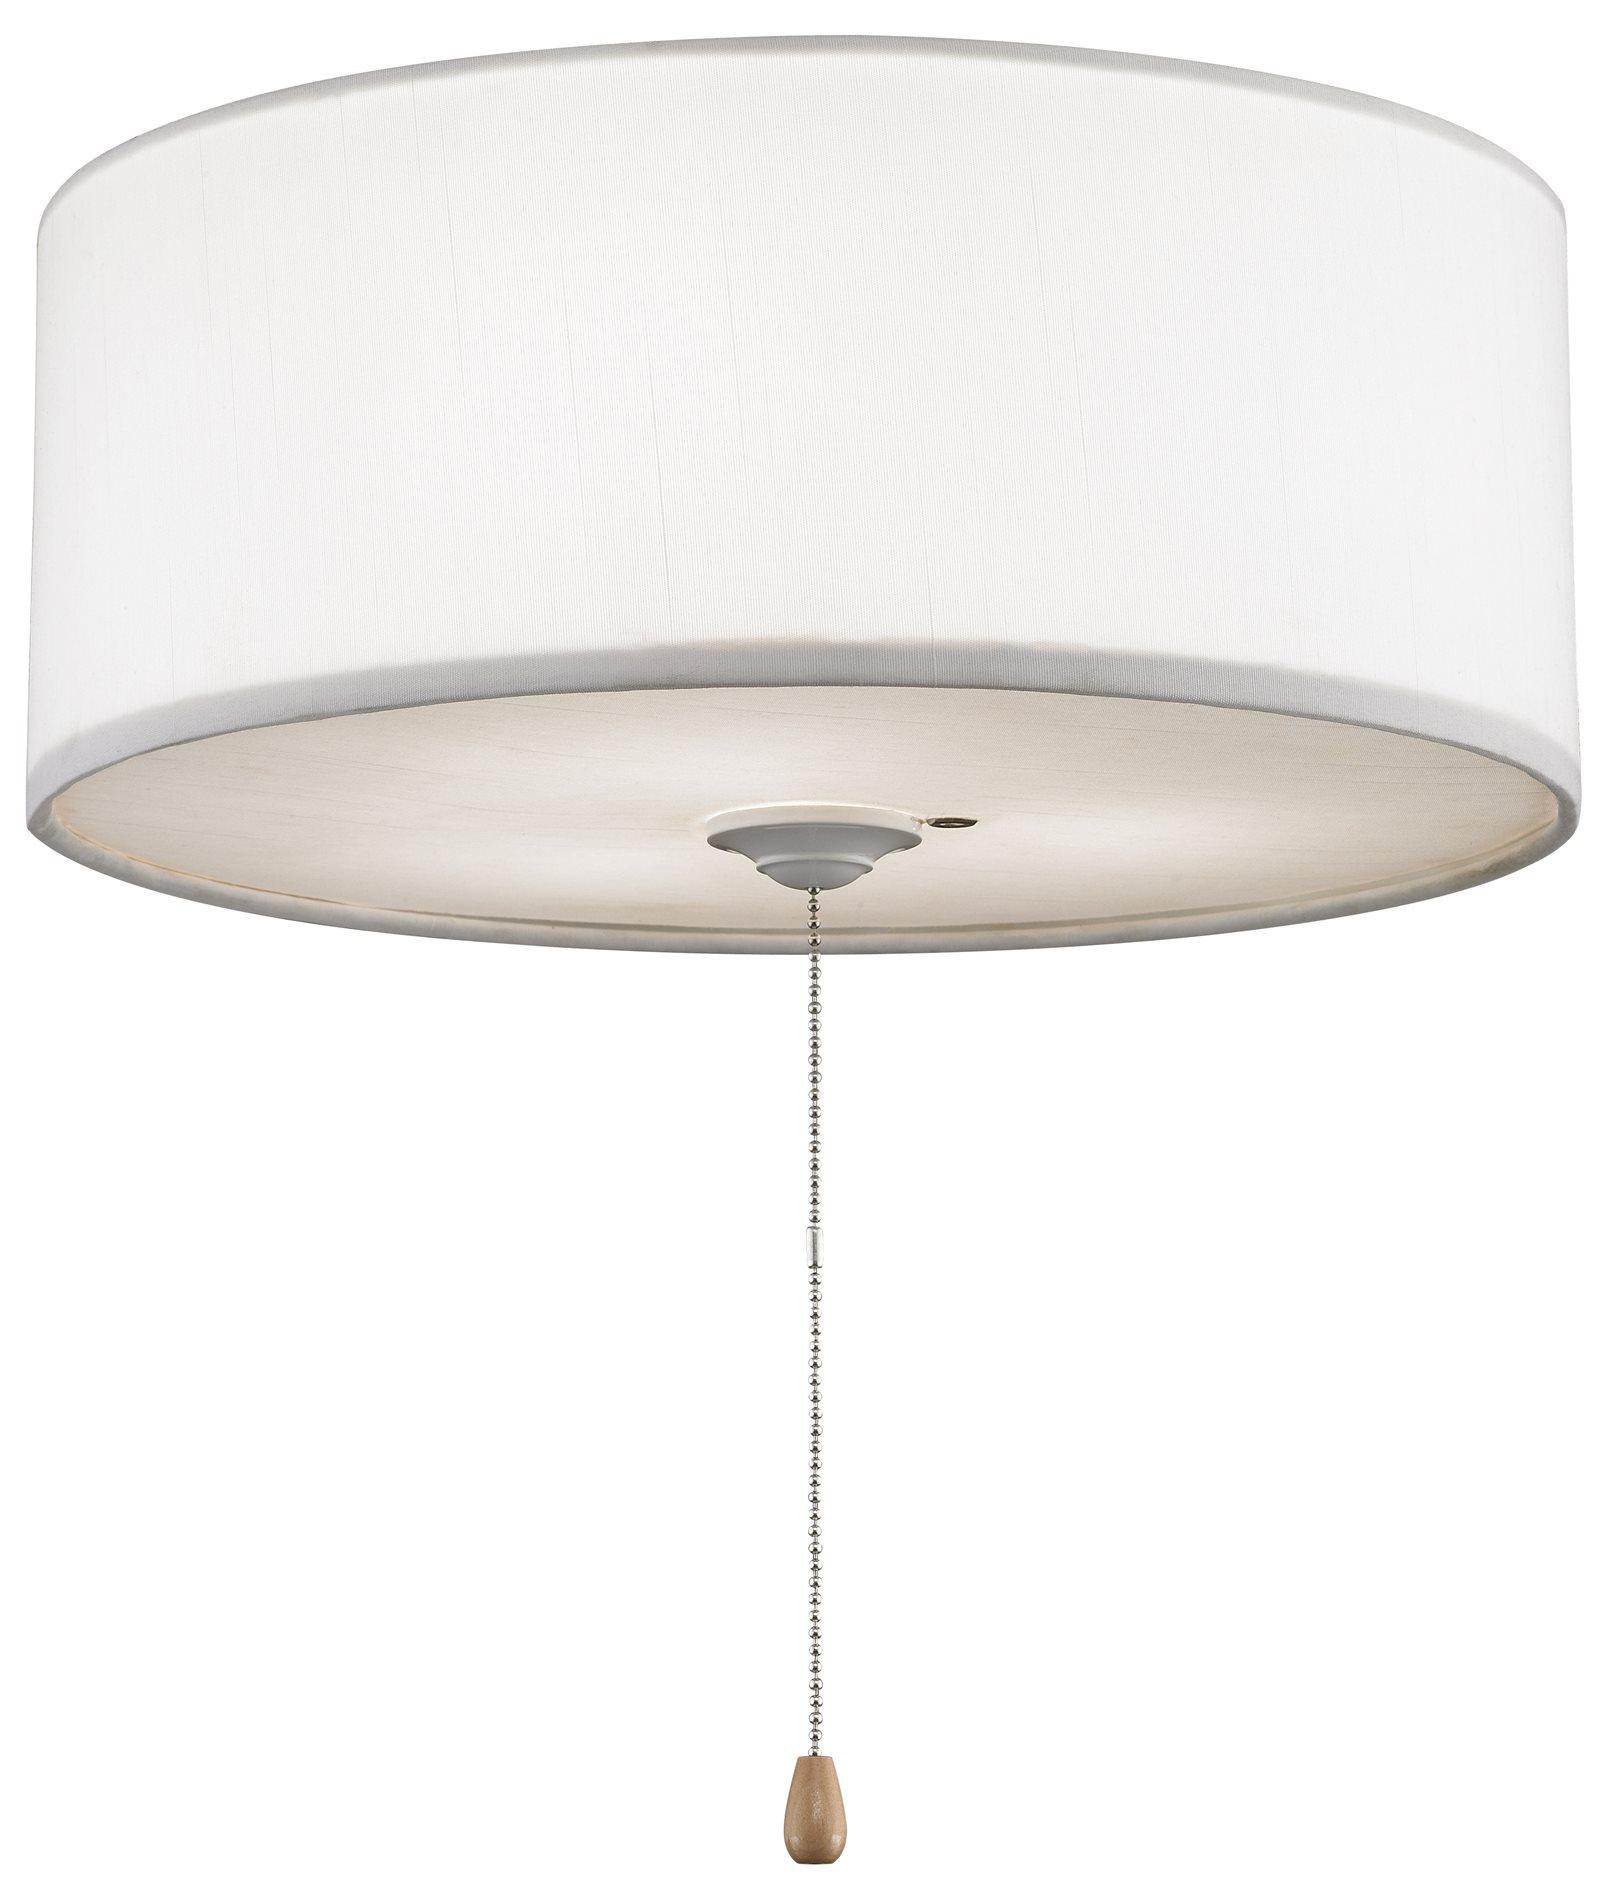 Ceiling Fan Light Shades